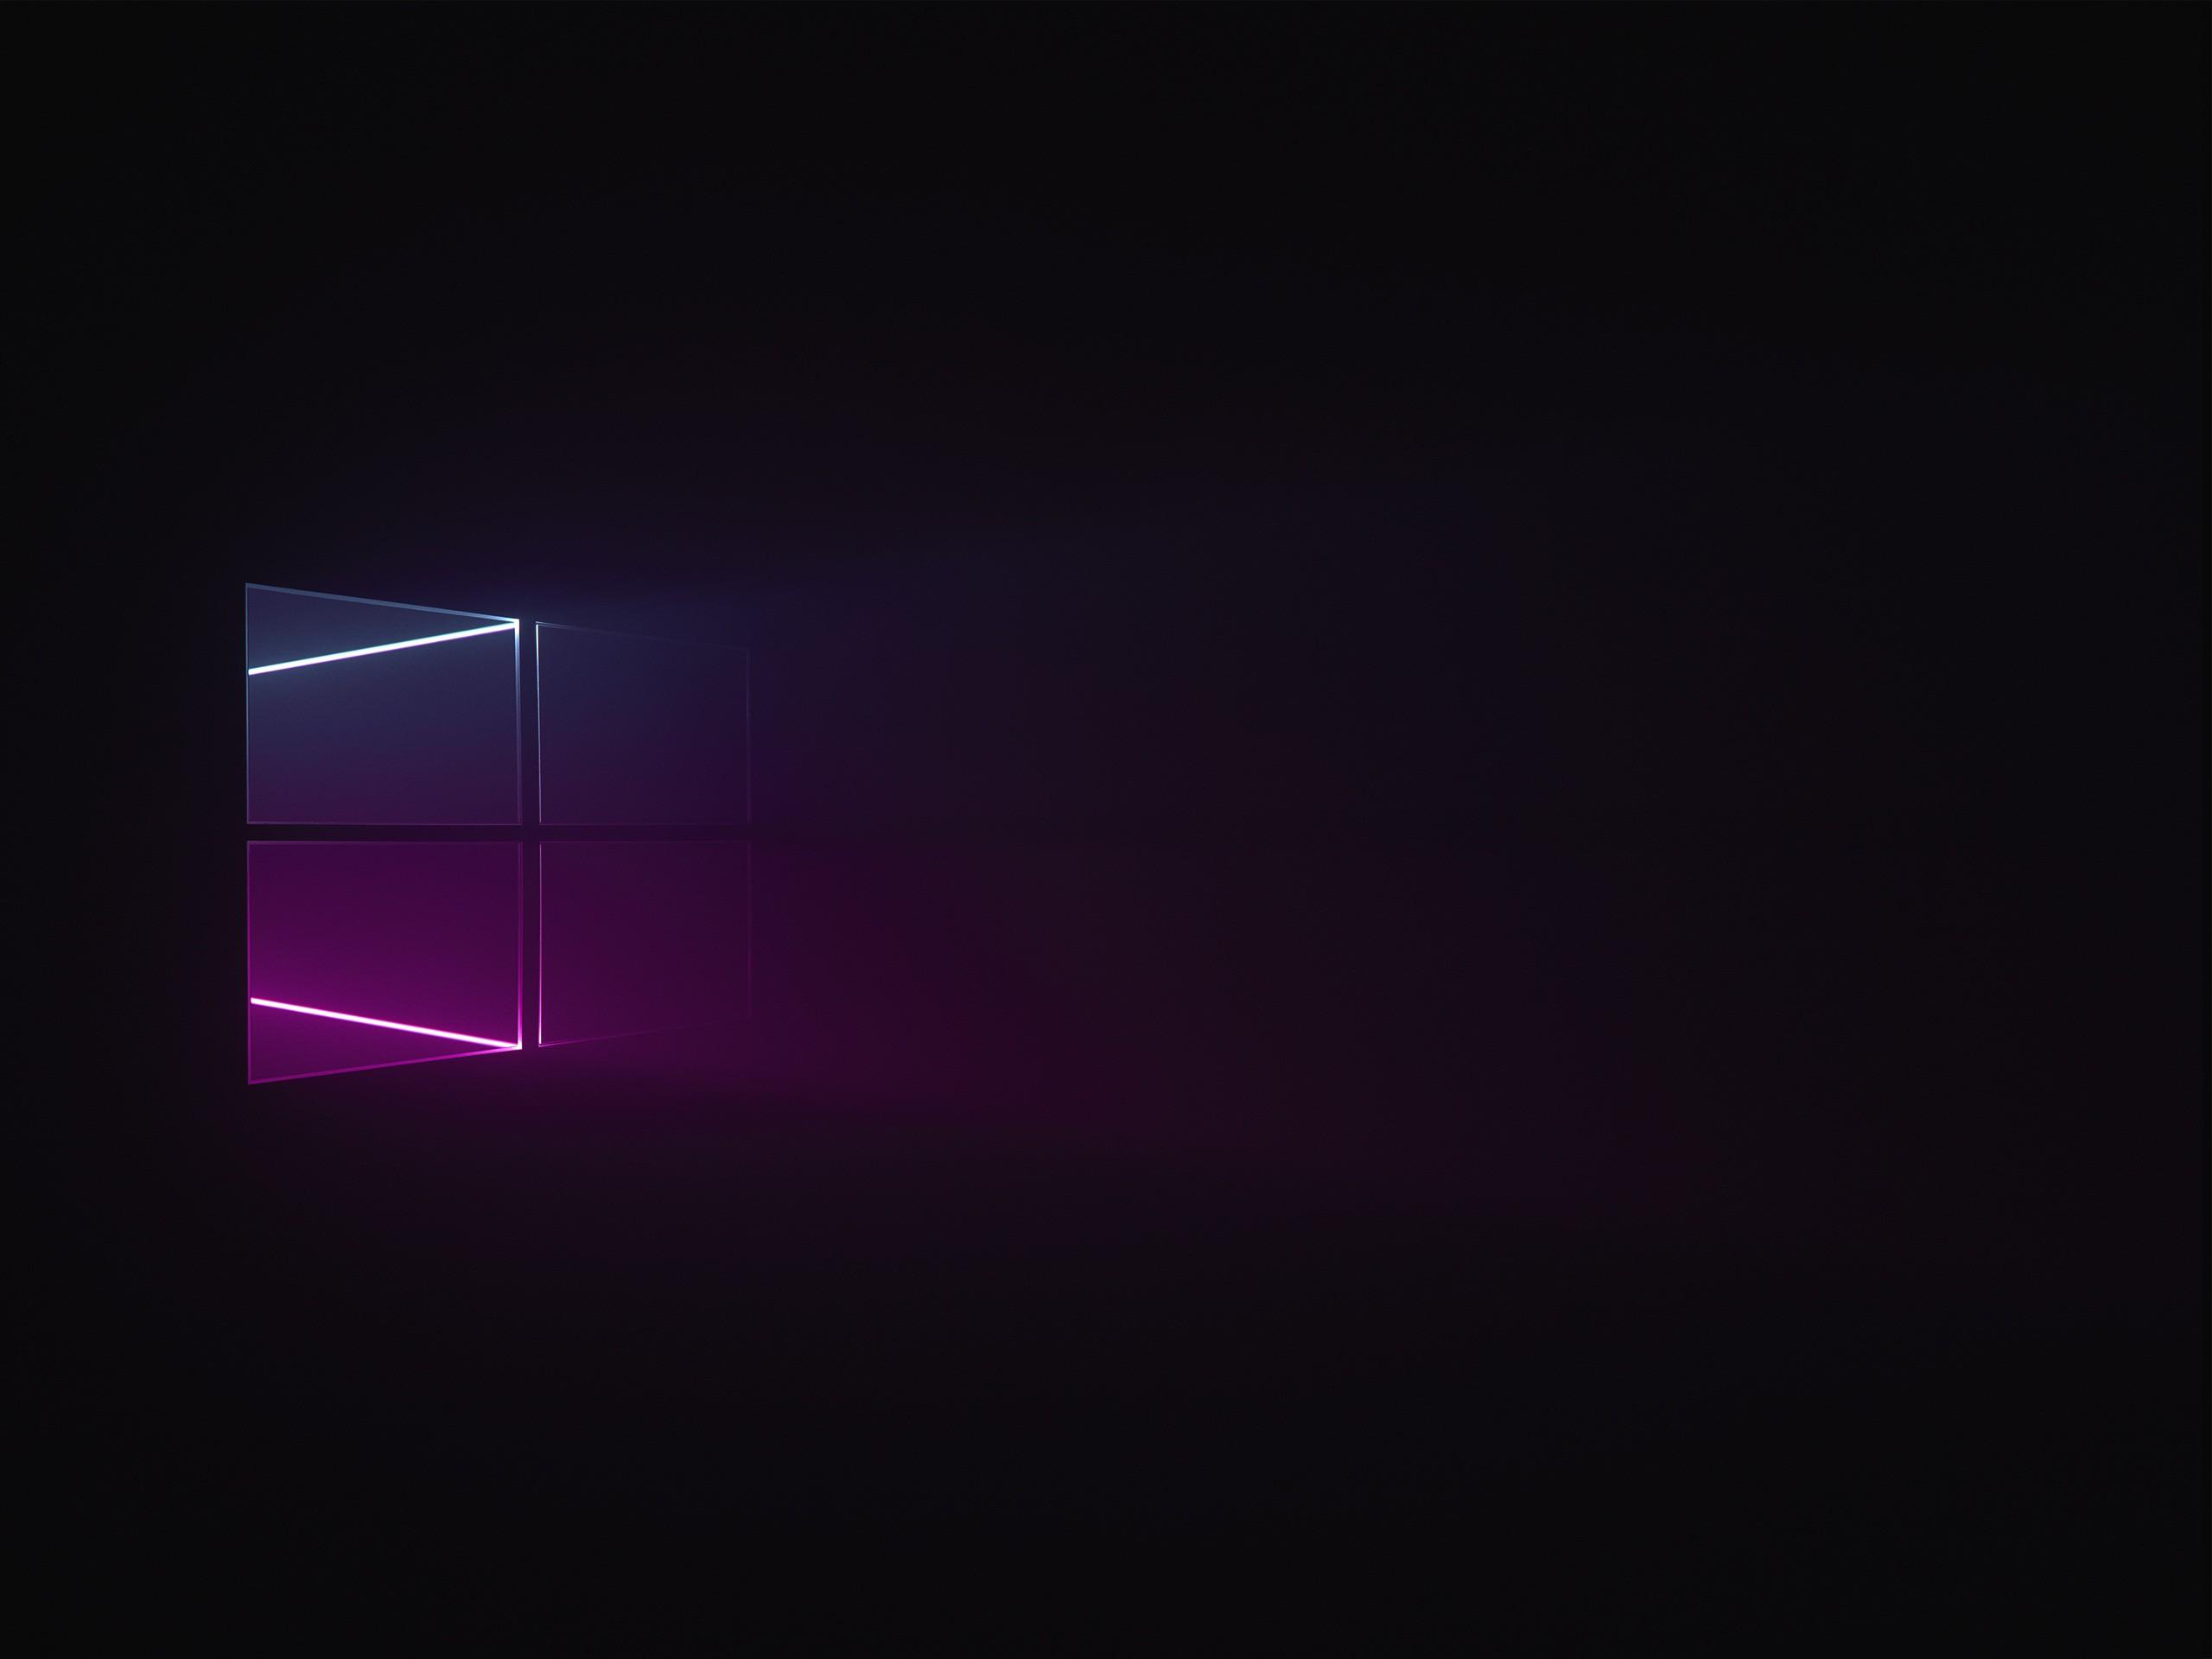 Windows 10 Abstract Gmunk Wallpapers Hd Desktop